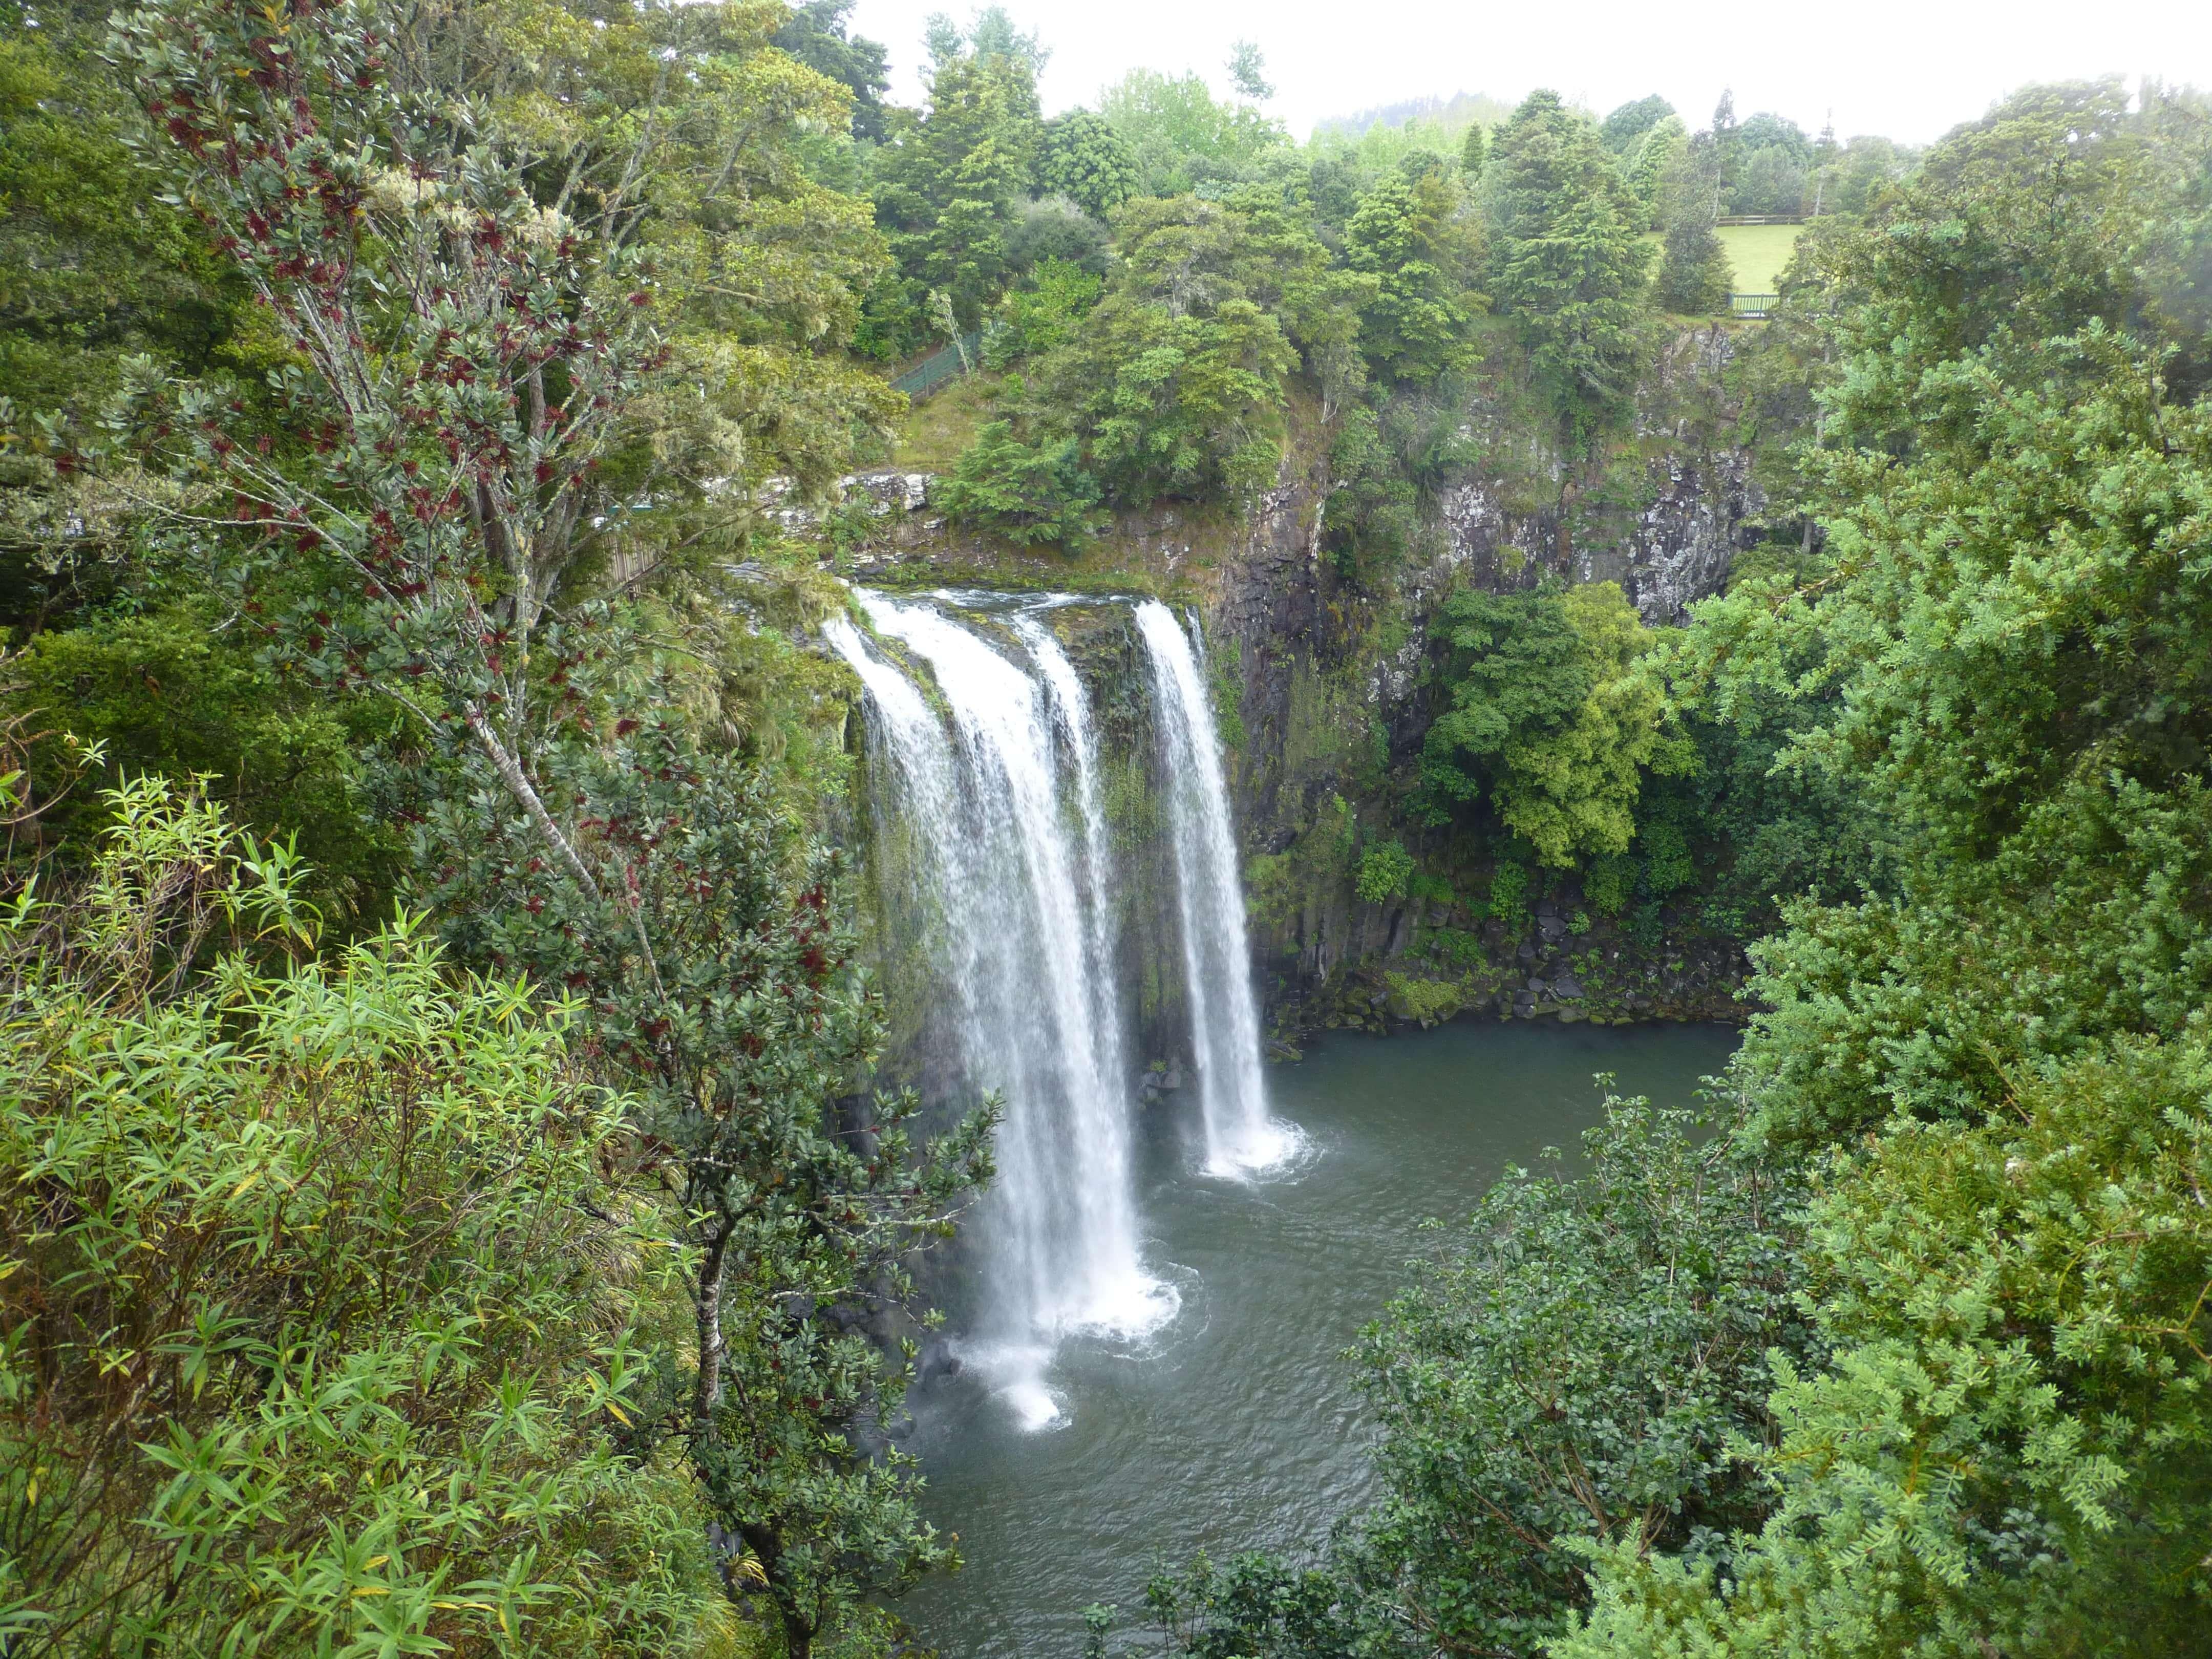 Weit weg Reisen, Whangarei Falls, Neuseeland 8